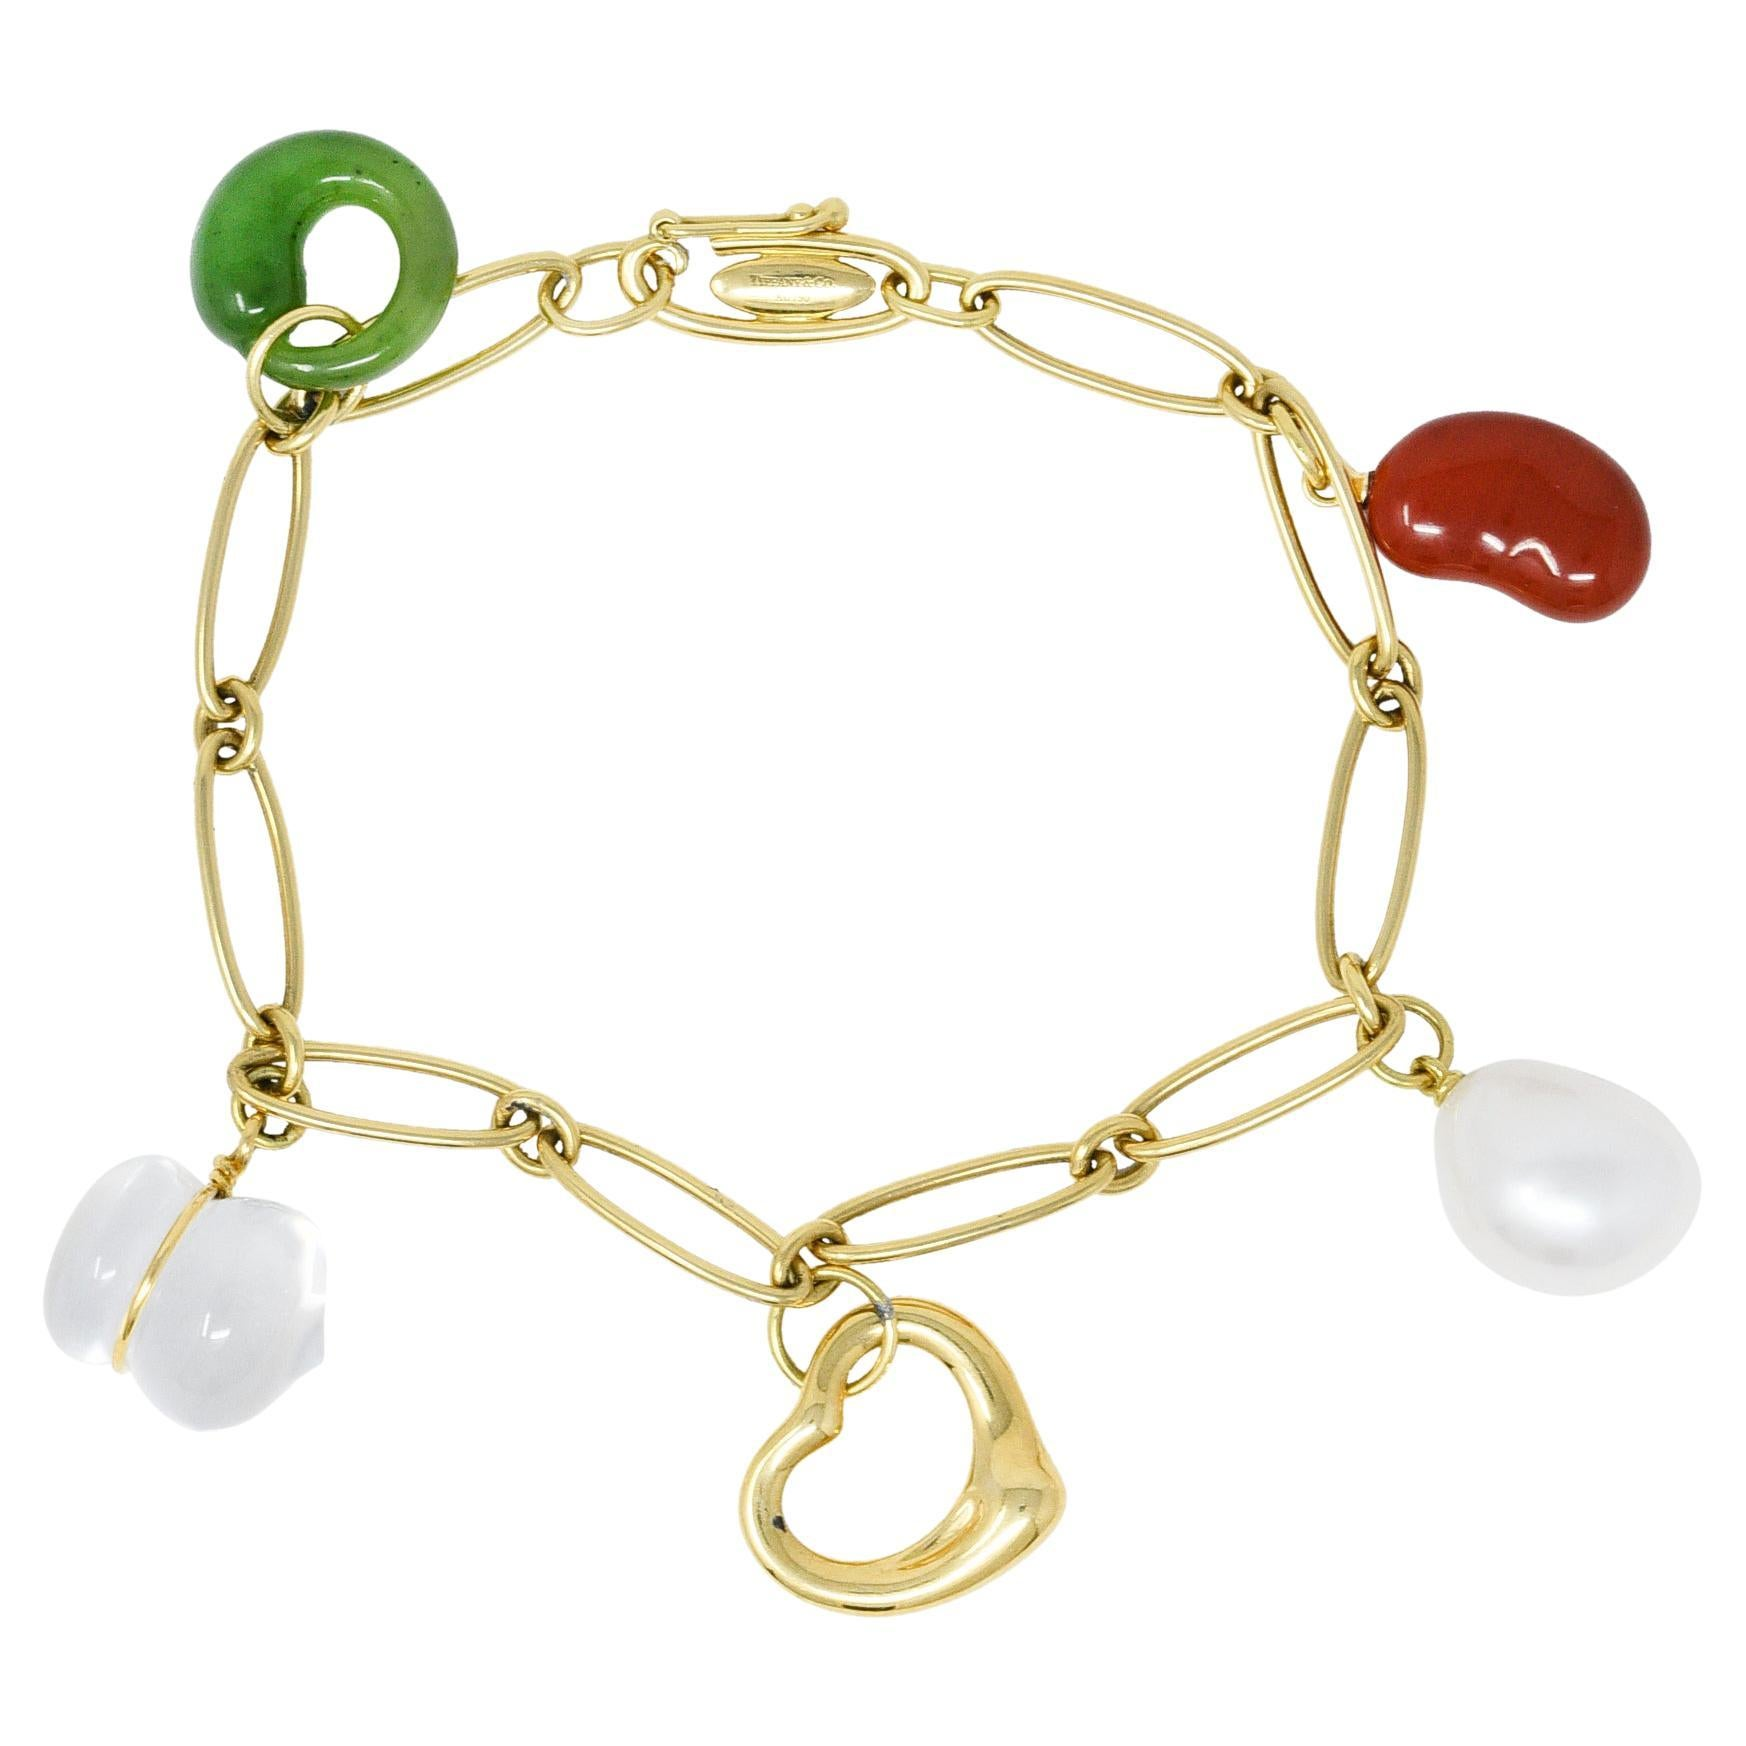 Elsa Peretti Tiffany & Co. Jade Agate Crystal 18 Karat Gold Five Charm Bracelet